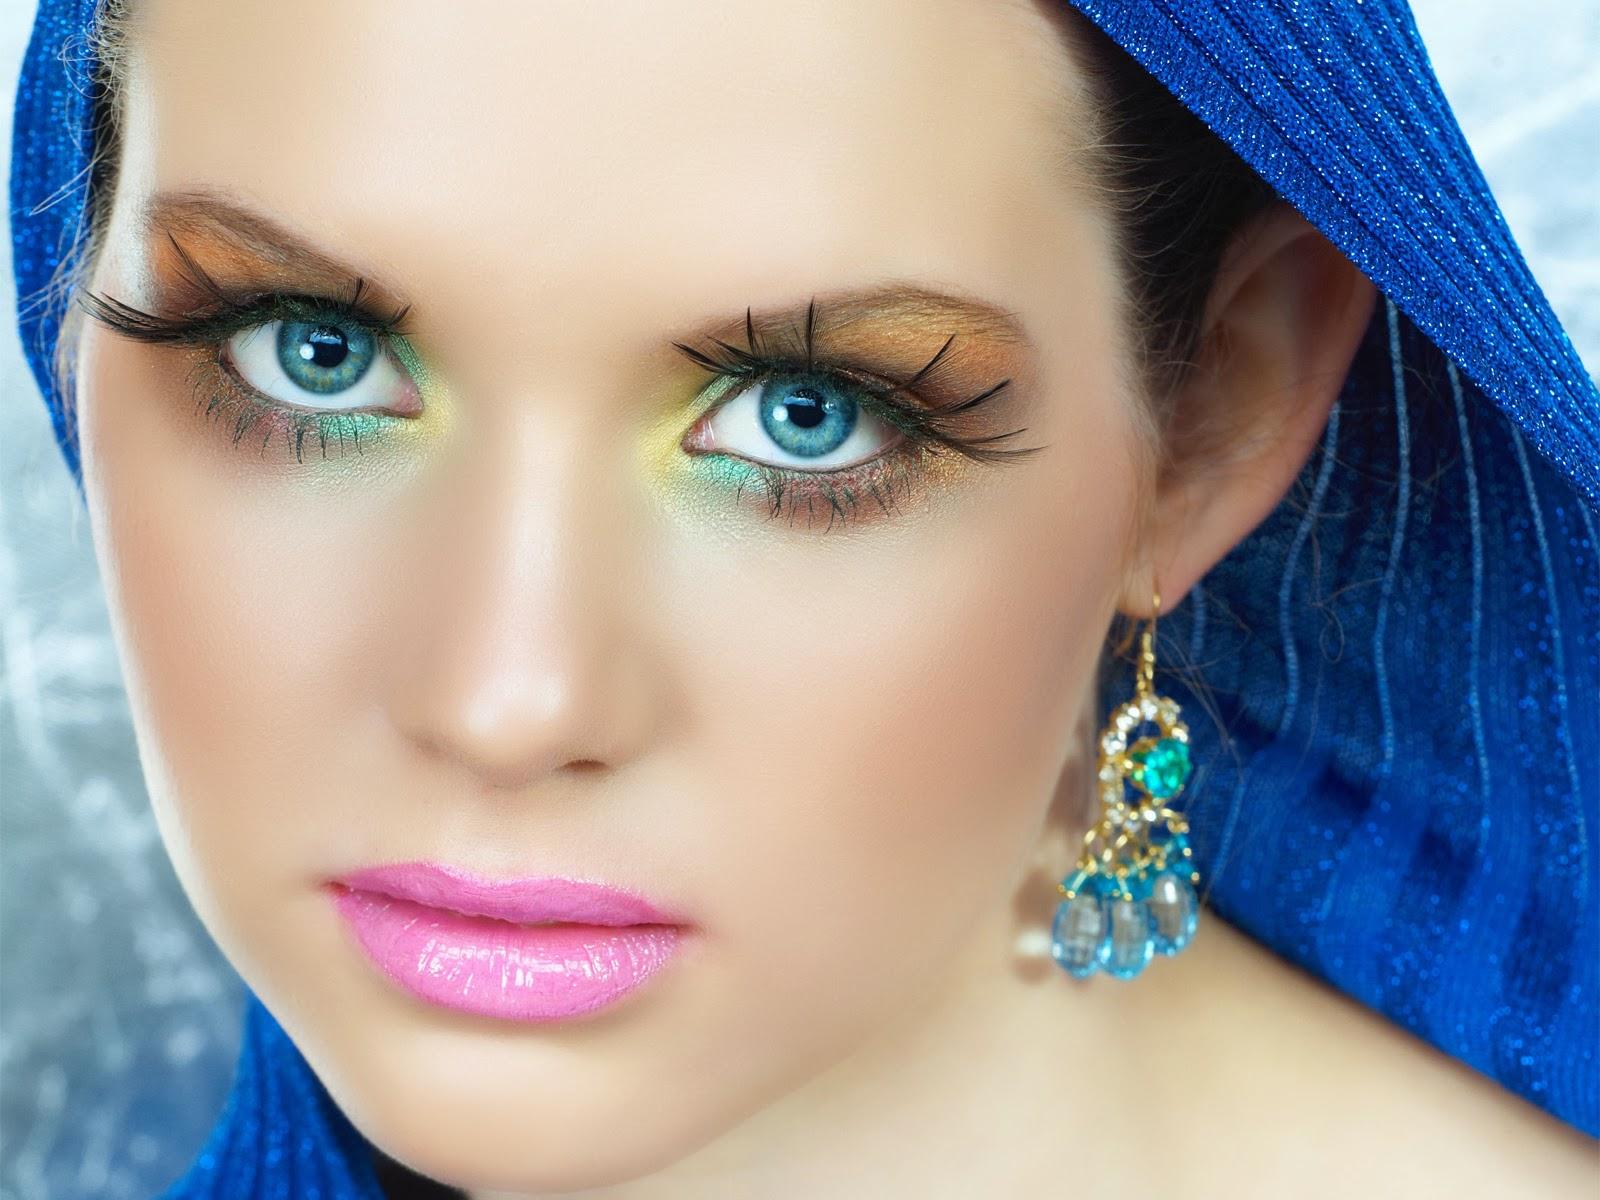 http://photoabgsexy.blogspot.com